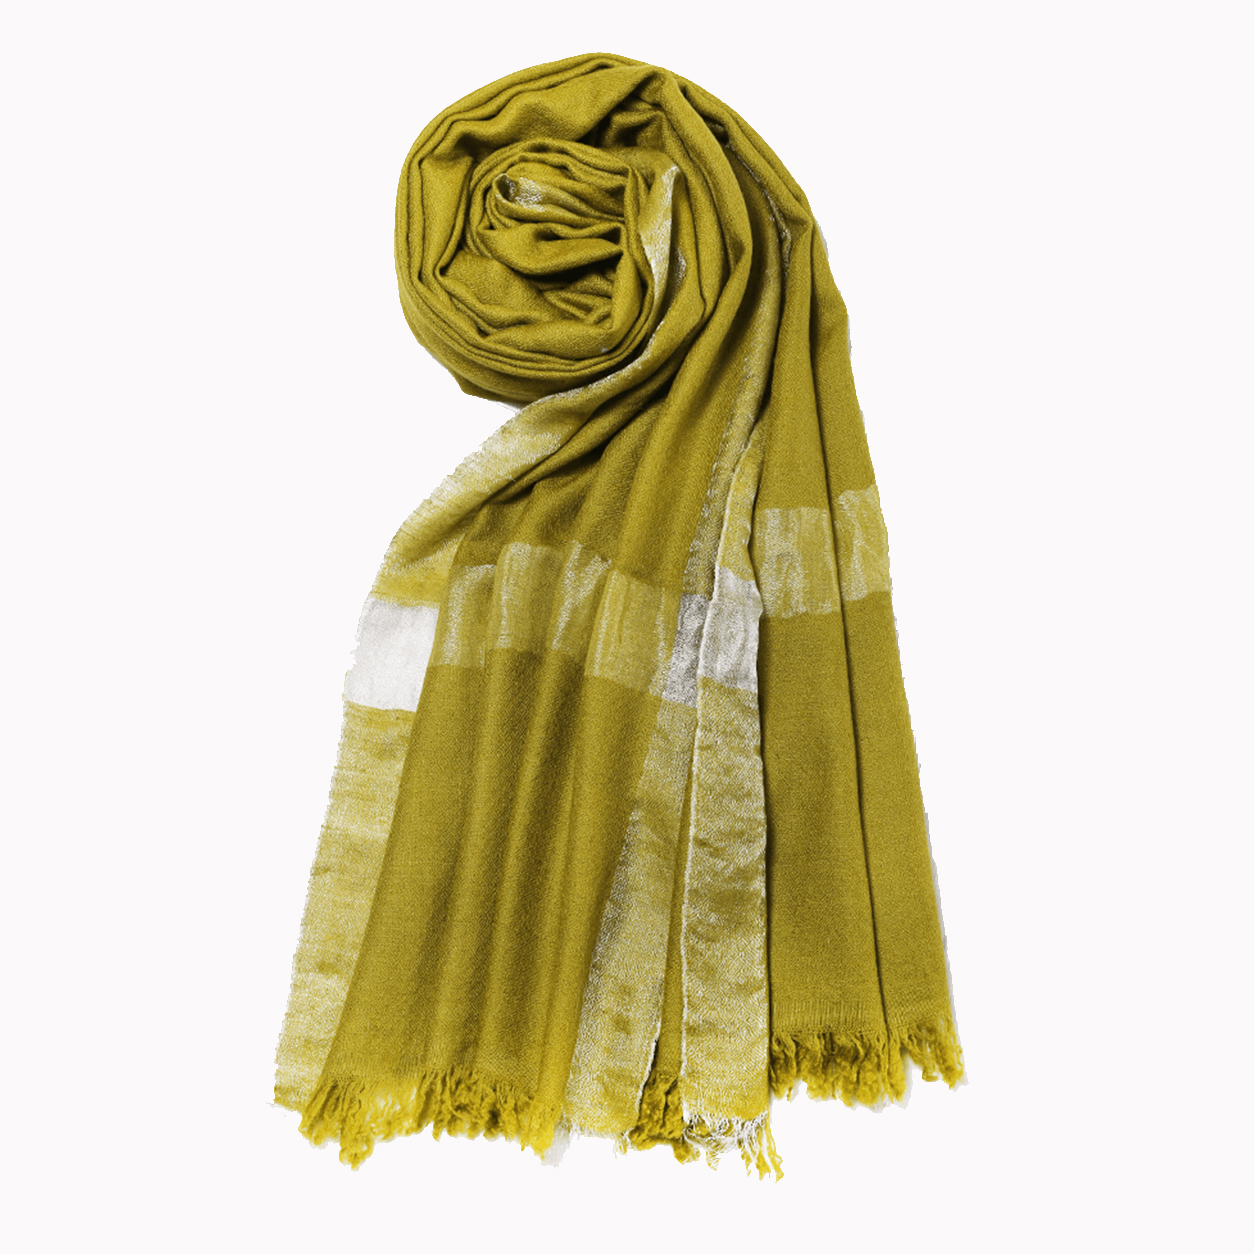 Zari Pashmina Stole - Sphene Yellow